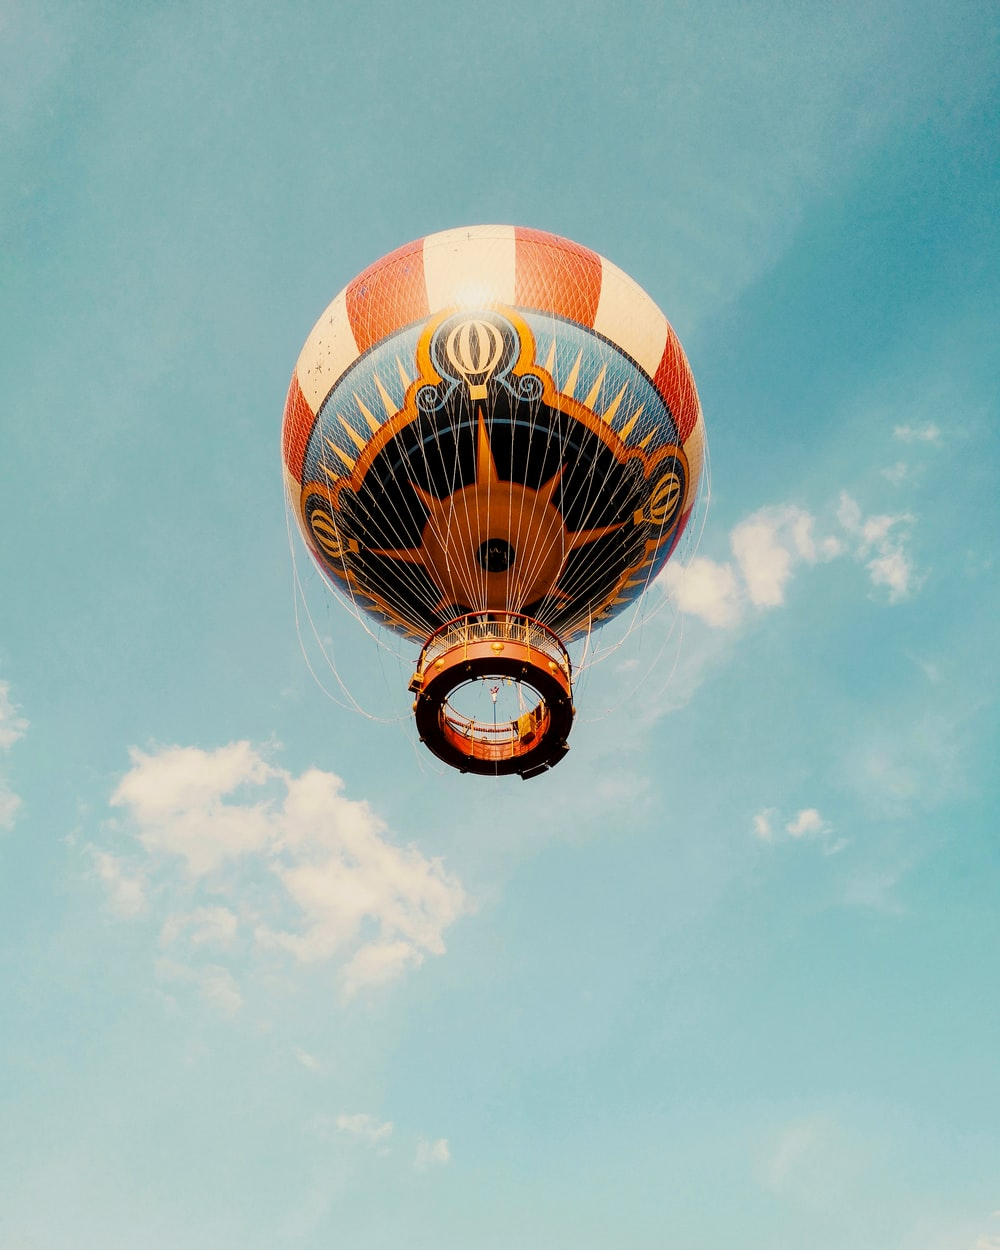 white and orange hot air balloon